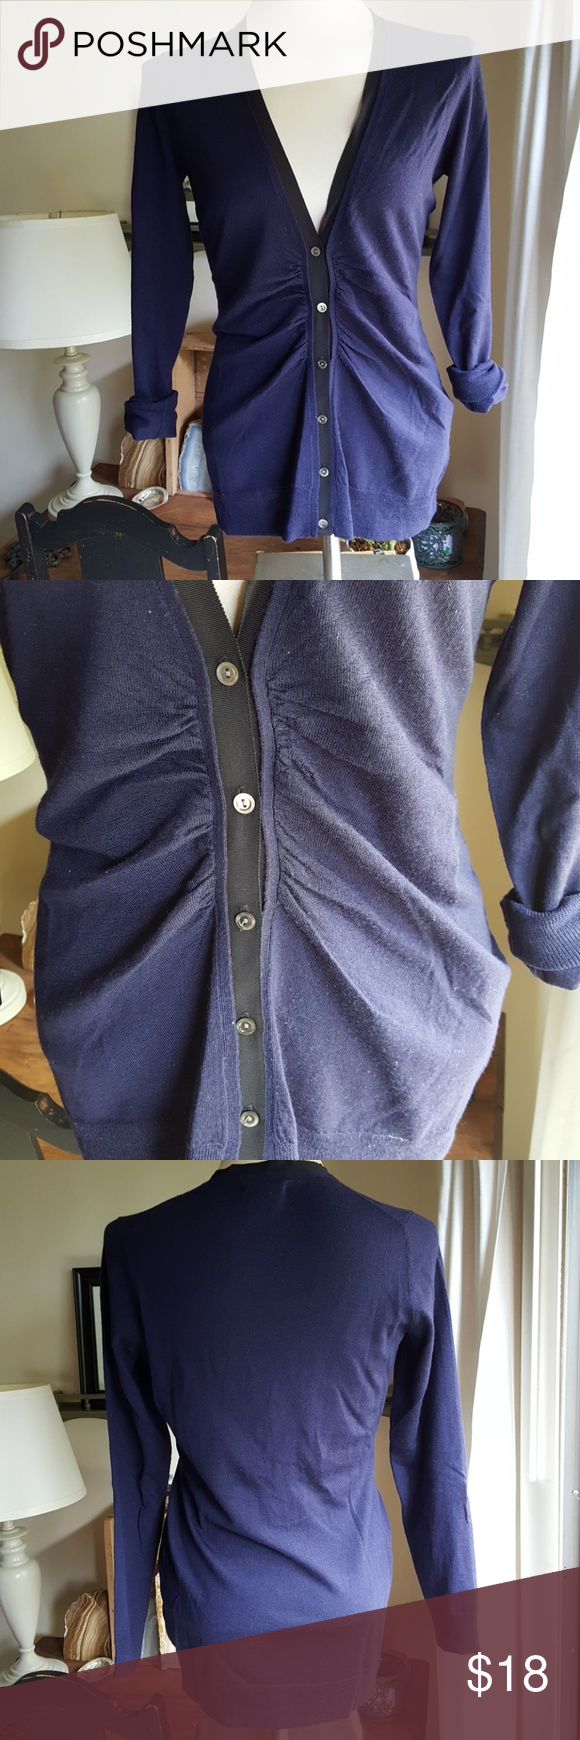 Lightweight Merino Cardigan   Navy blue cardigan, Grosgrain and ...